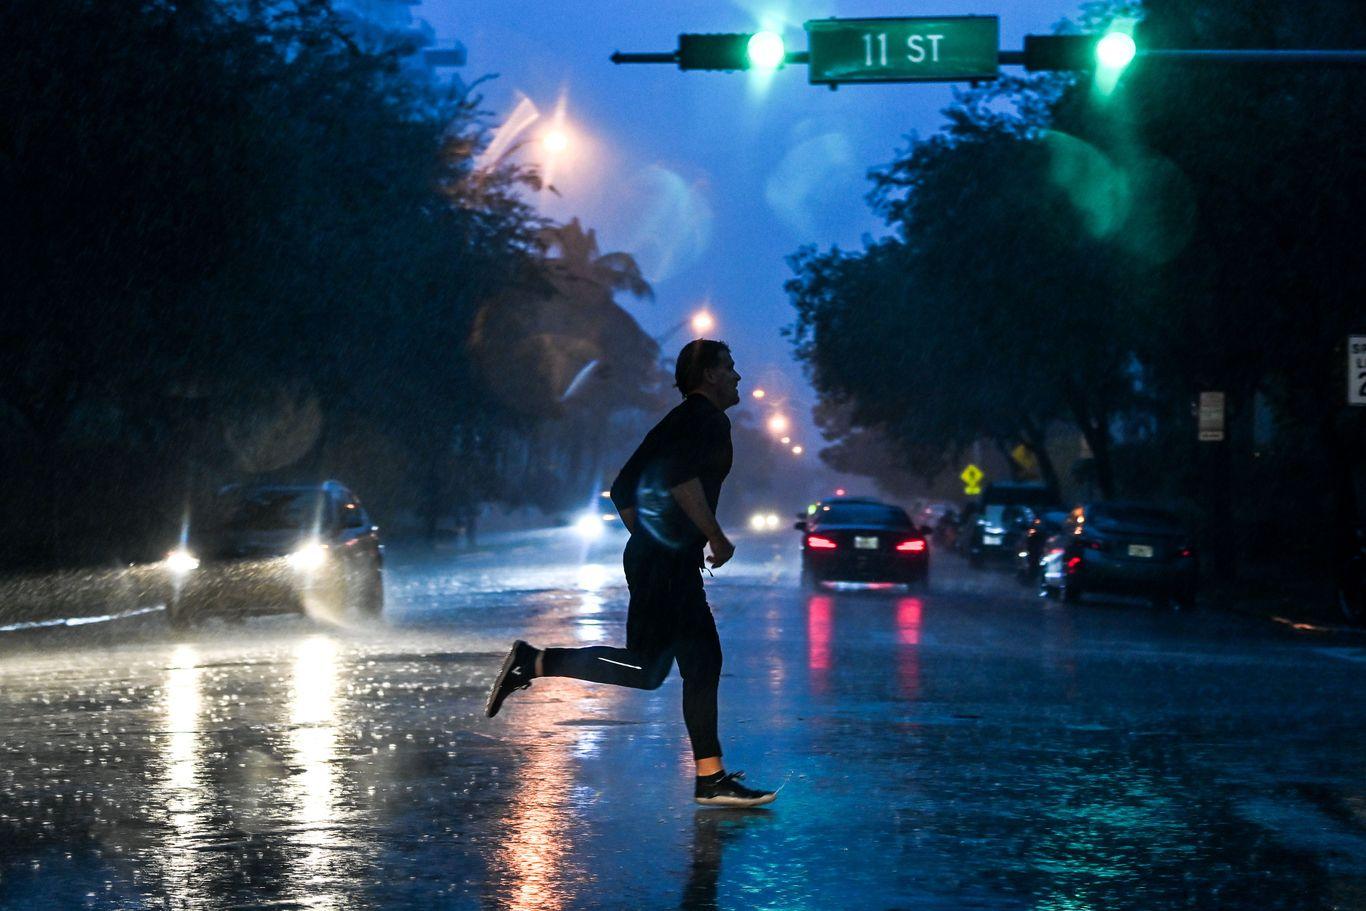 Hurricane alert issued as Tropical Storm Eta lashes South Florida thumbnail